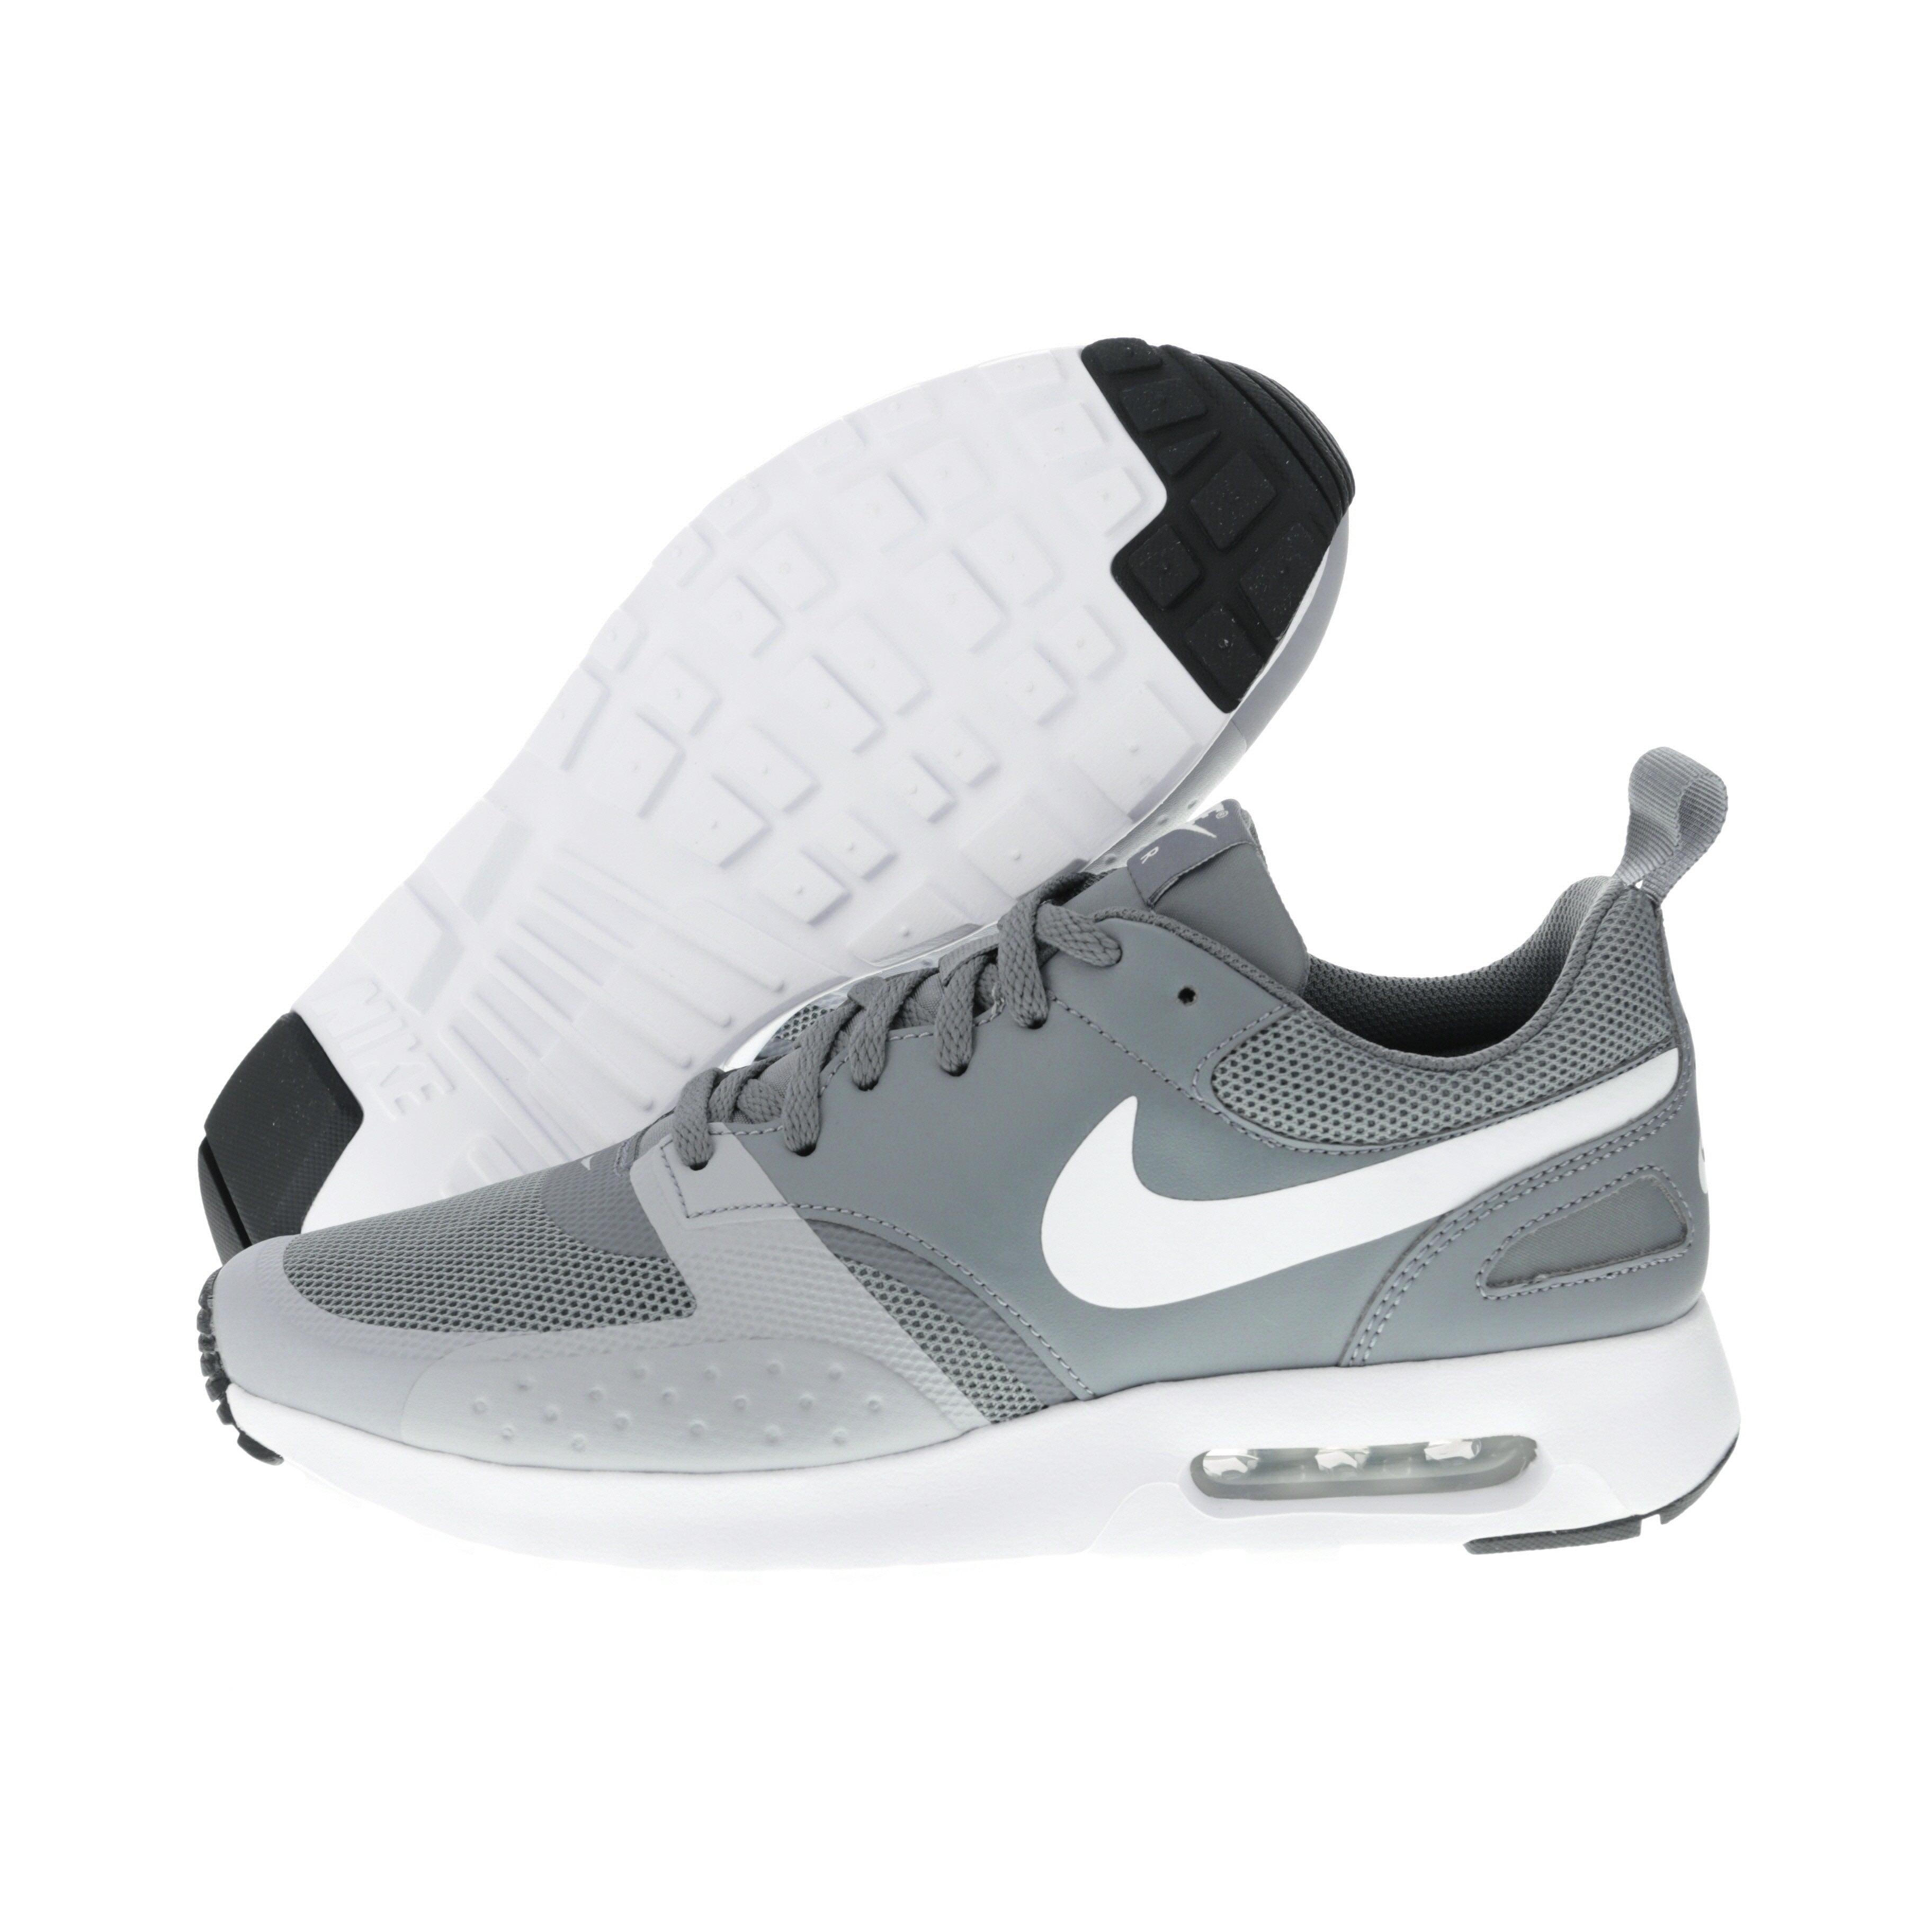 Nike Air Max Vision GreyWhite